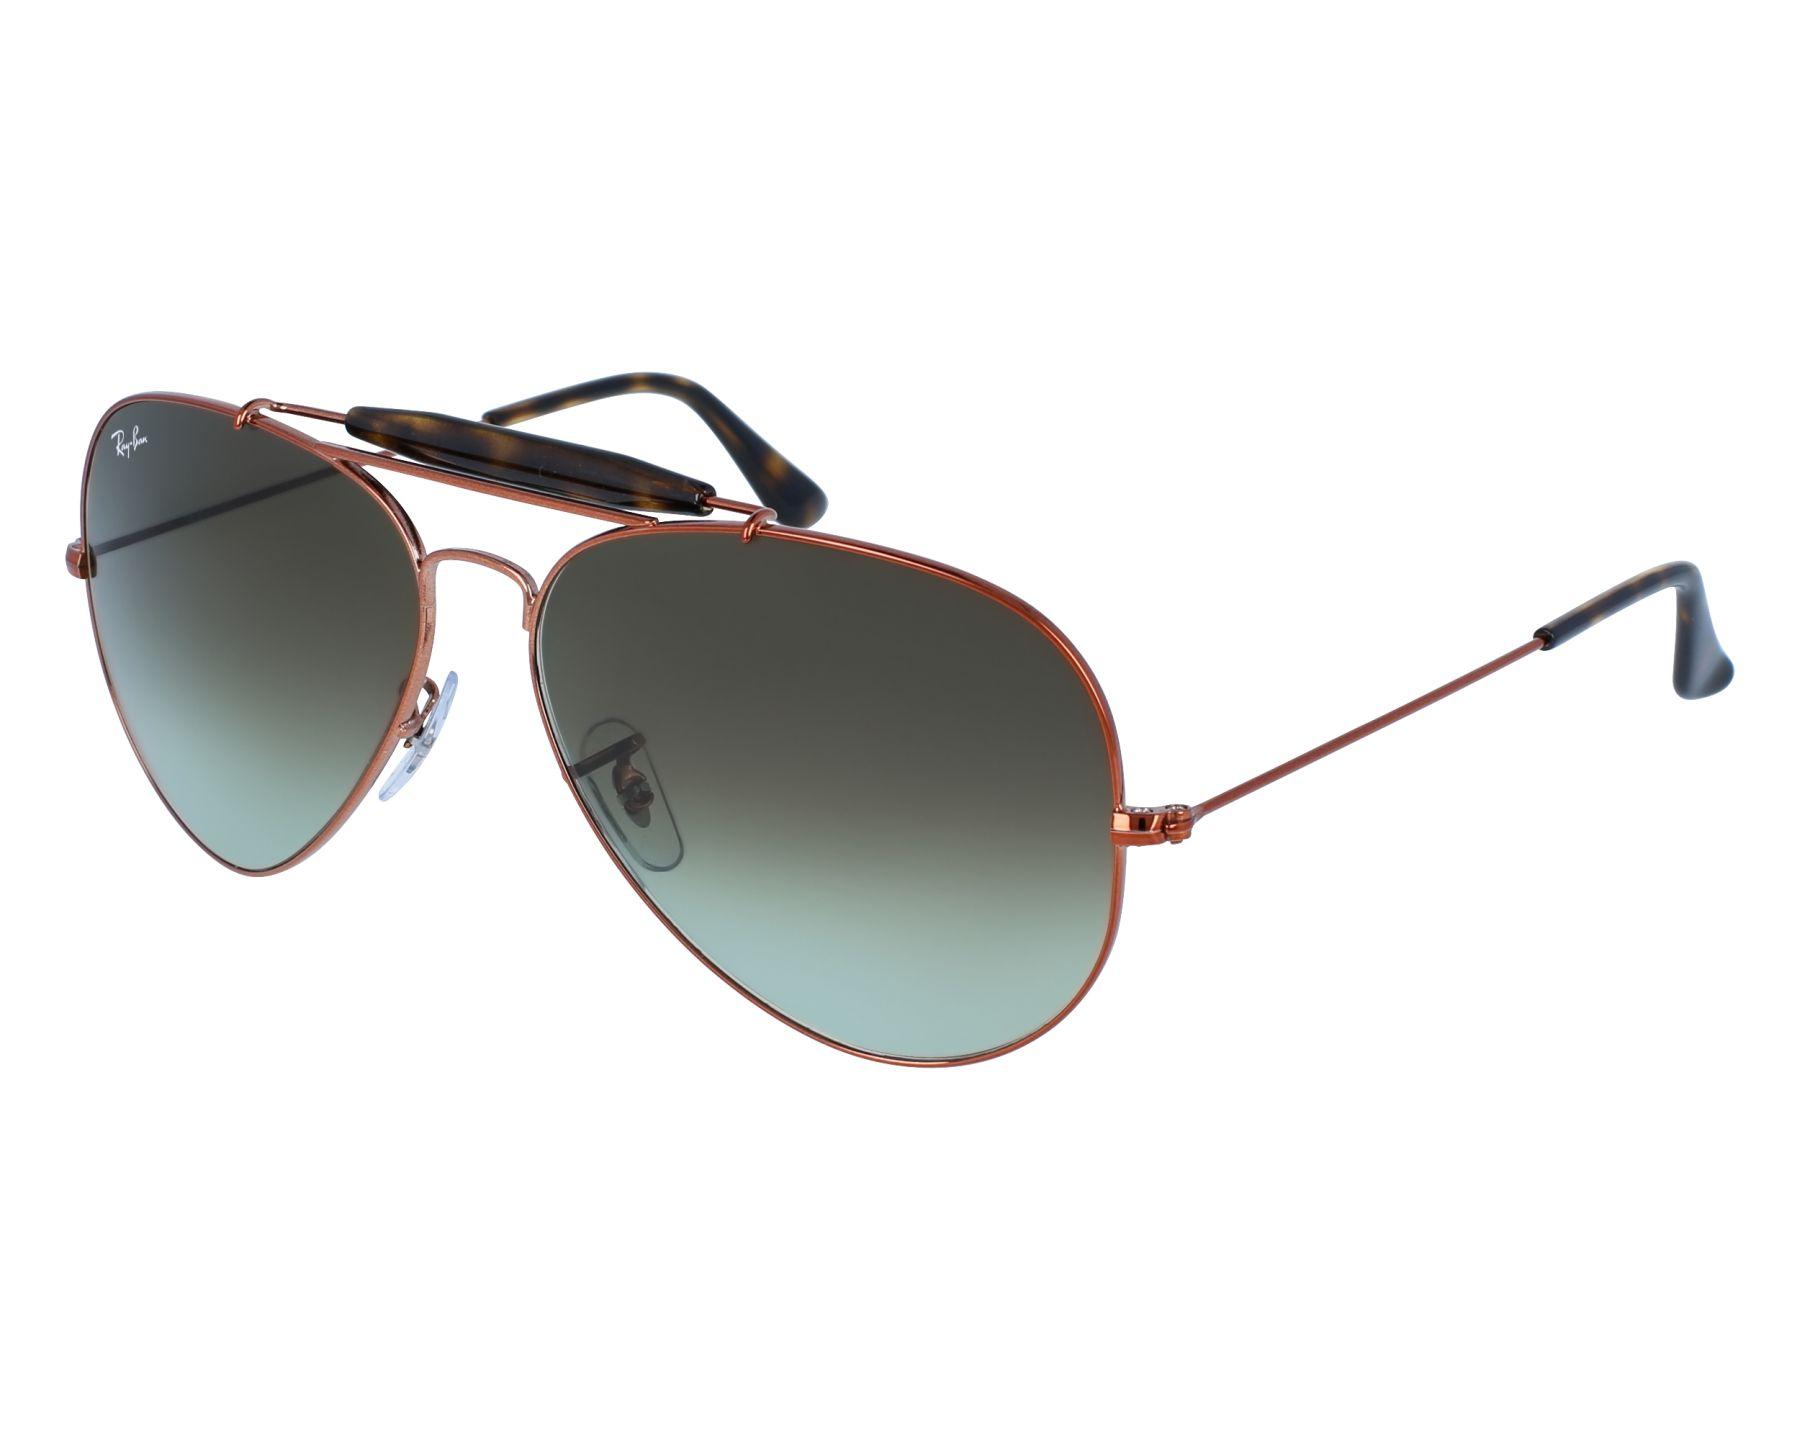 1e97ea662d get sunglasses ray ban rb 3029 9002a6 62 14 bronze front view a73f4 e69bf